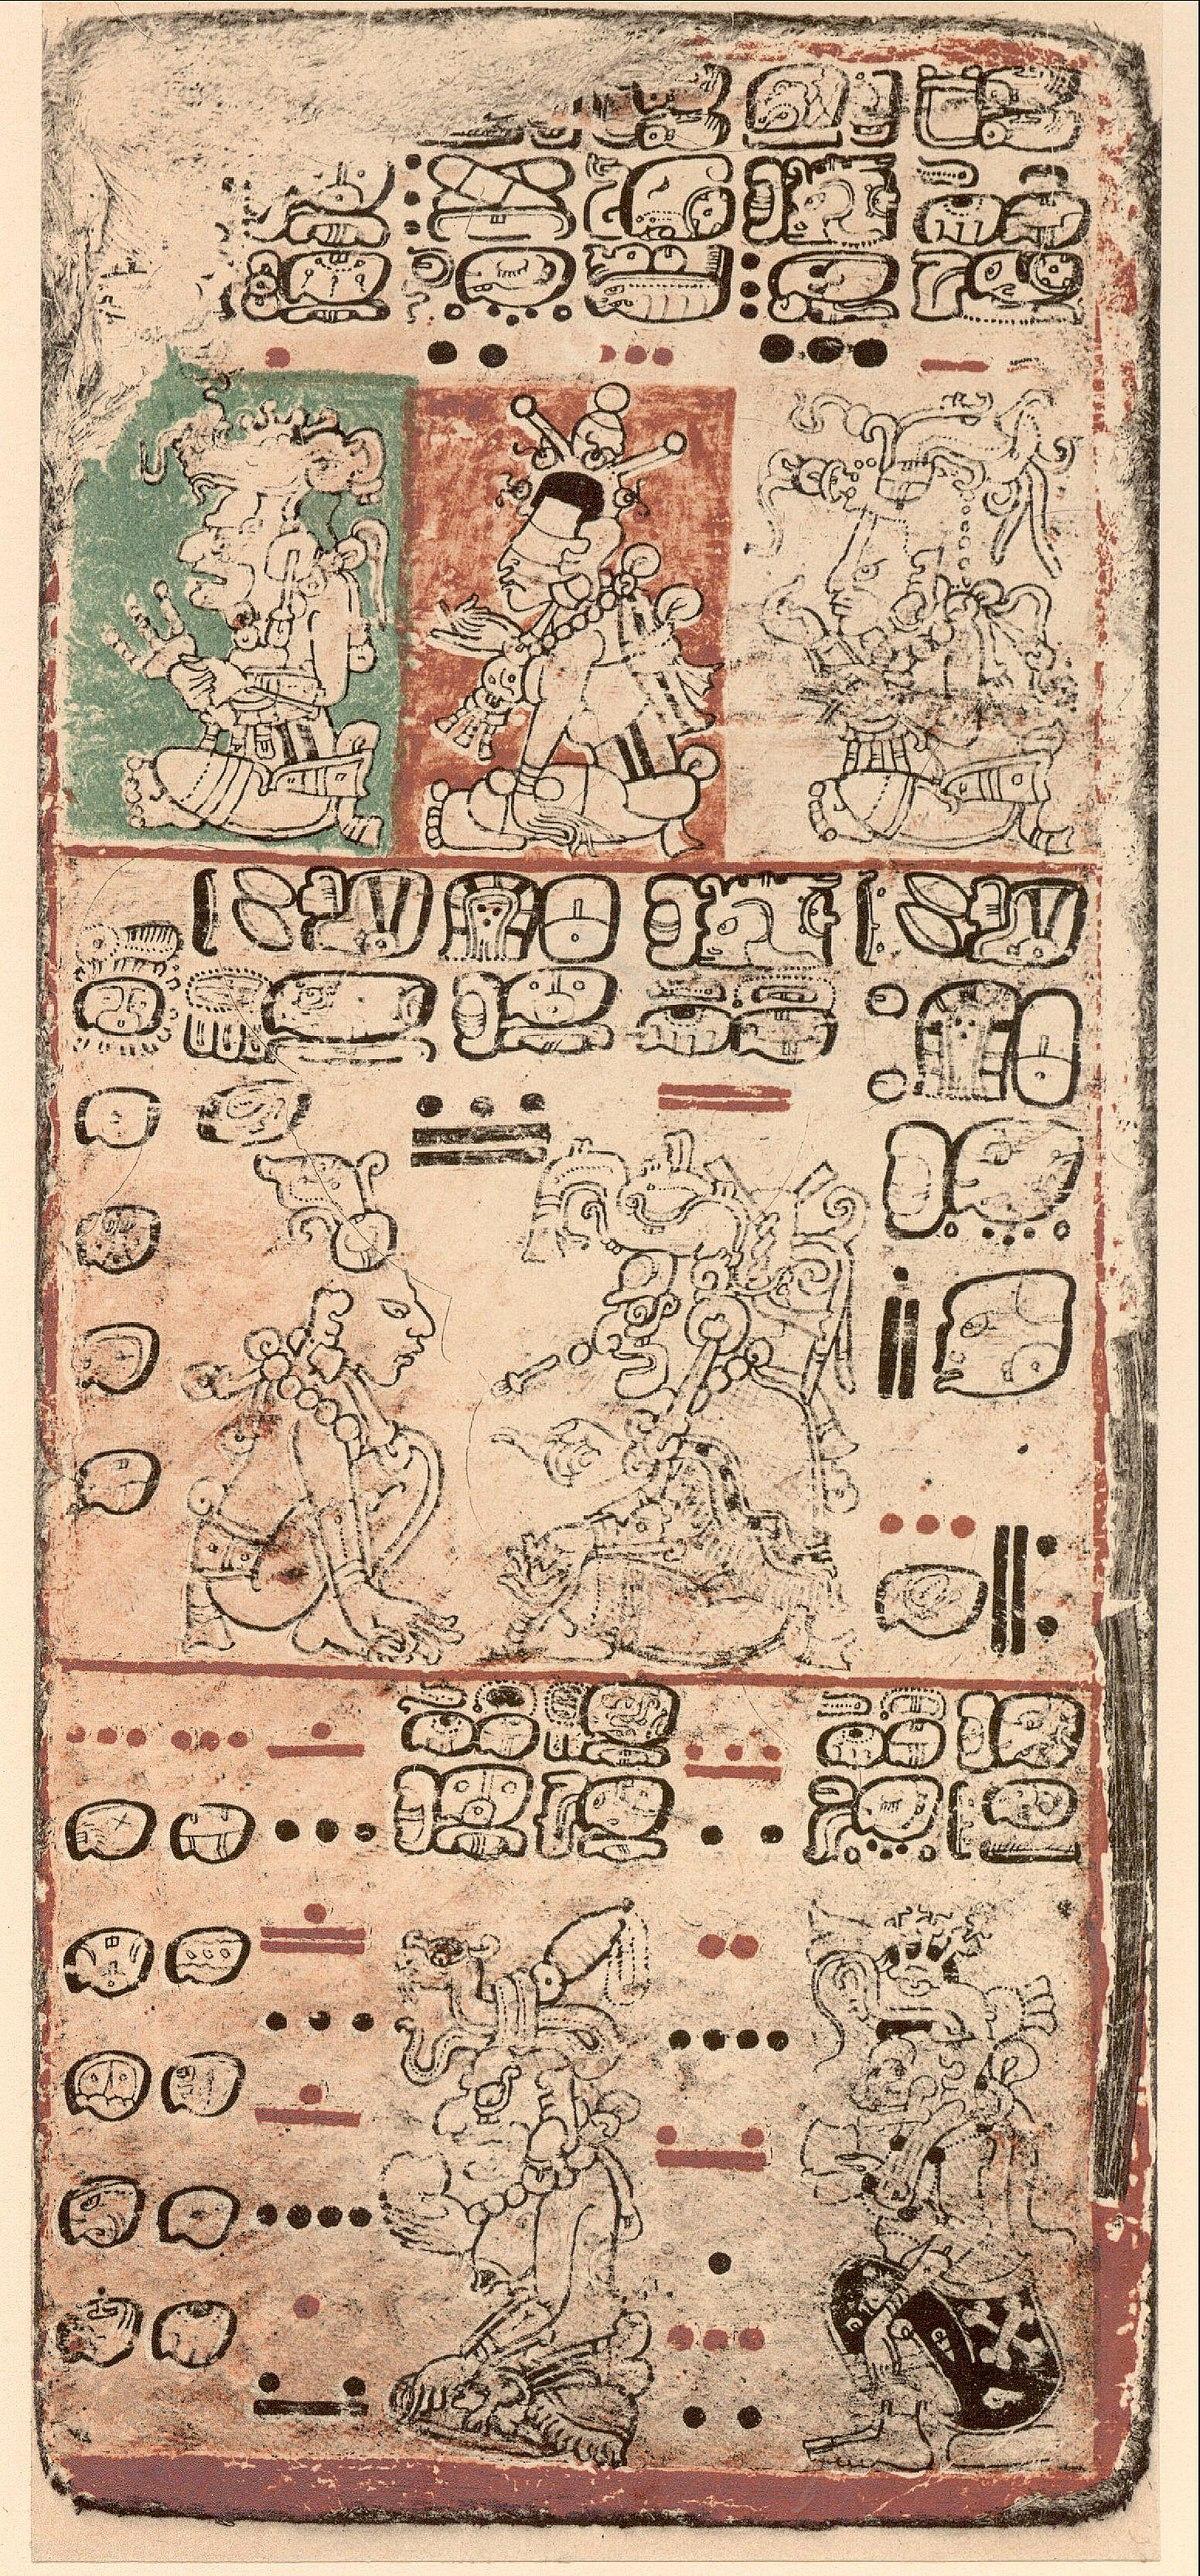 Calendario In Spagnolo.Calendario Maya Wikipedia